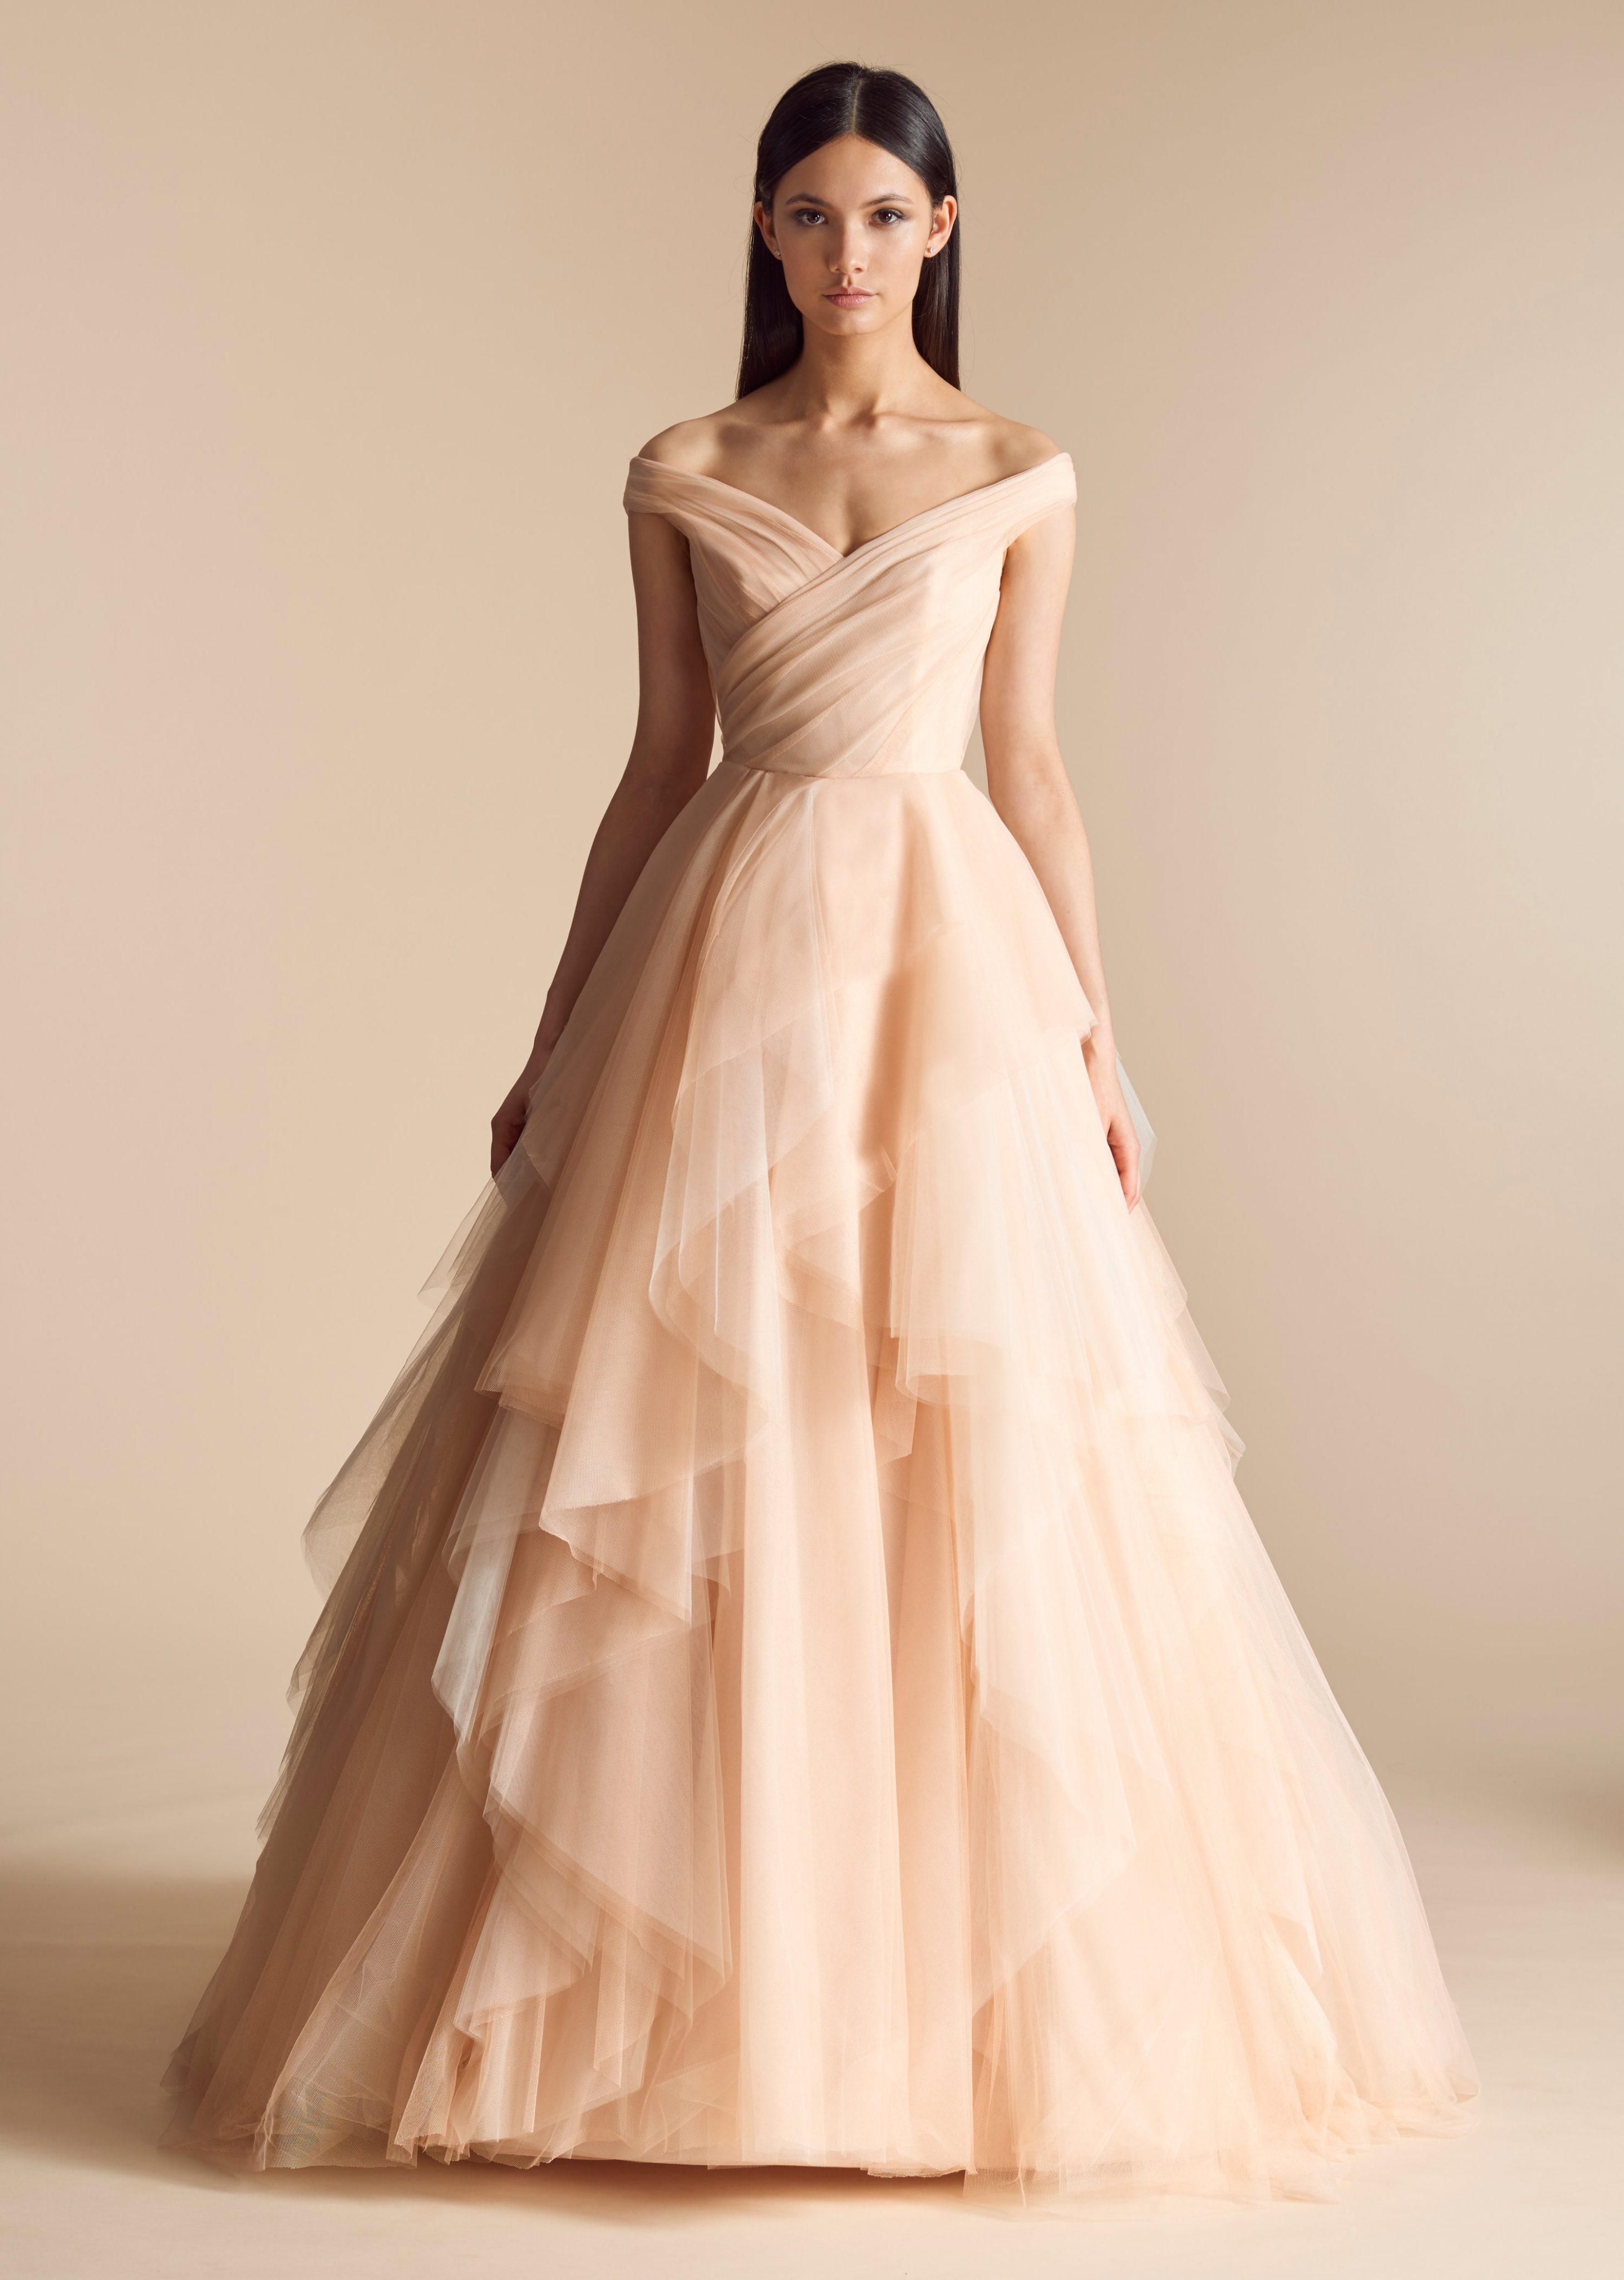 Consignment Wedding Dresses.Second Hand Wedding Dresses Nyc Saddha